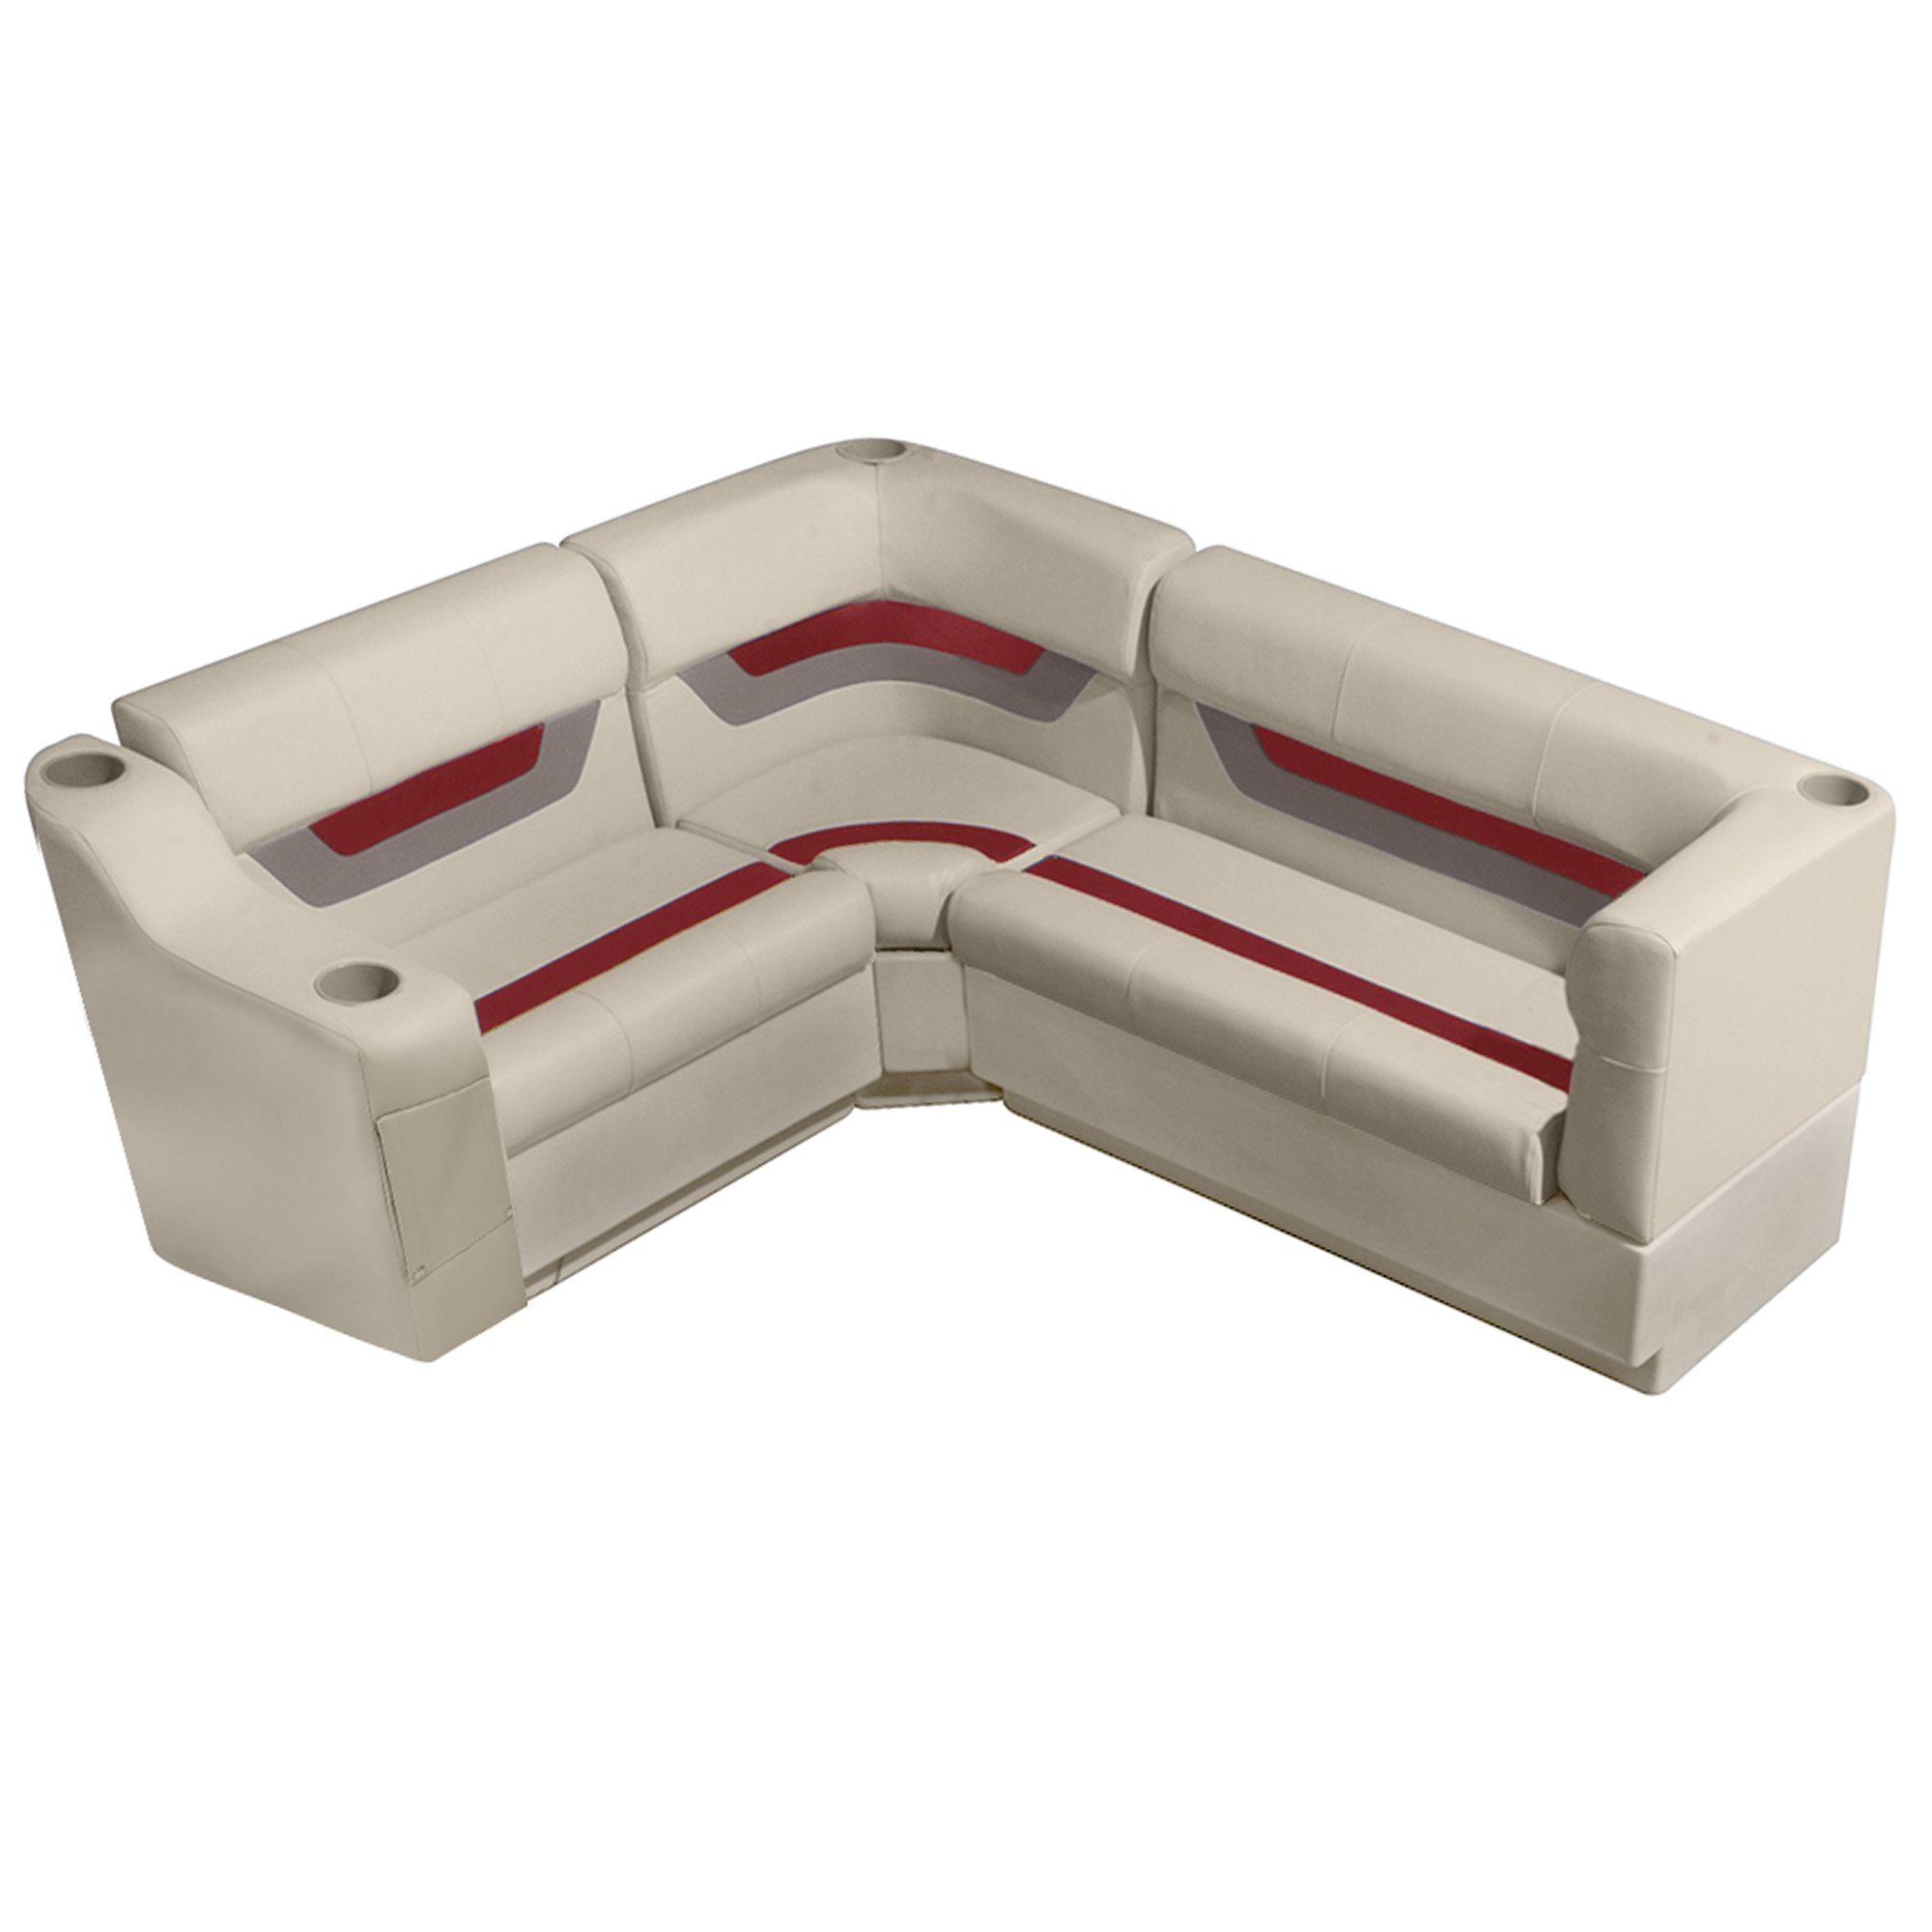 "Designer Pontoon Furniture - 61"" Rear Seat Package, Platinum/Dark Red/Mocha"